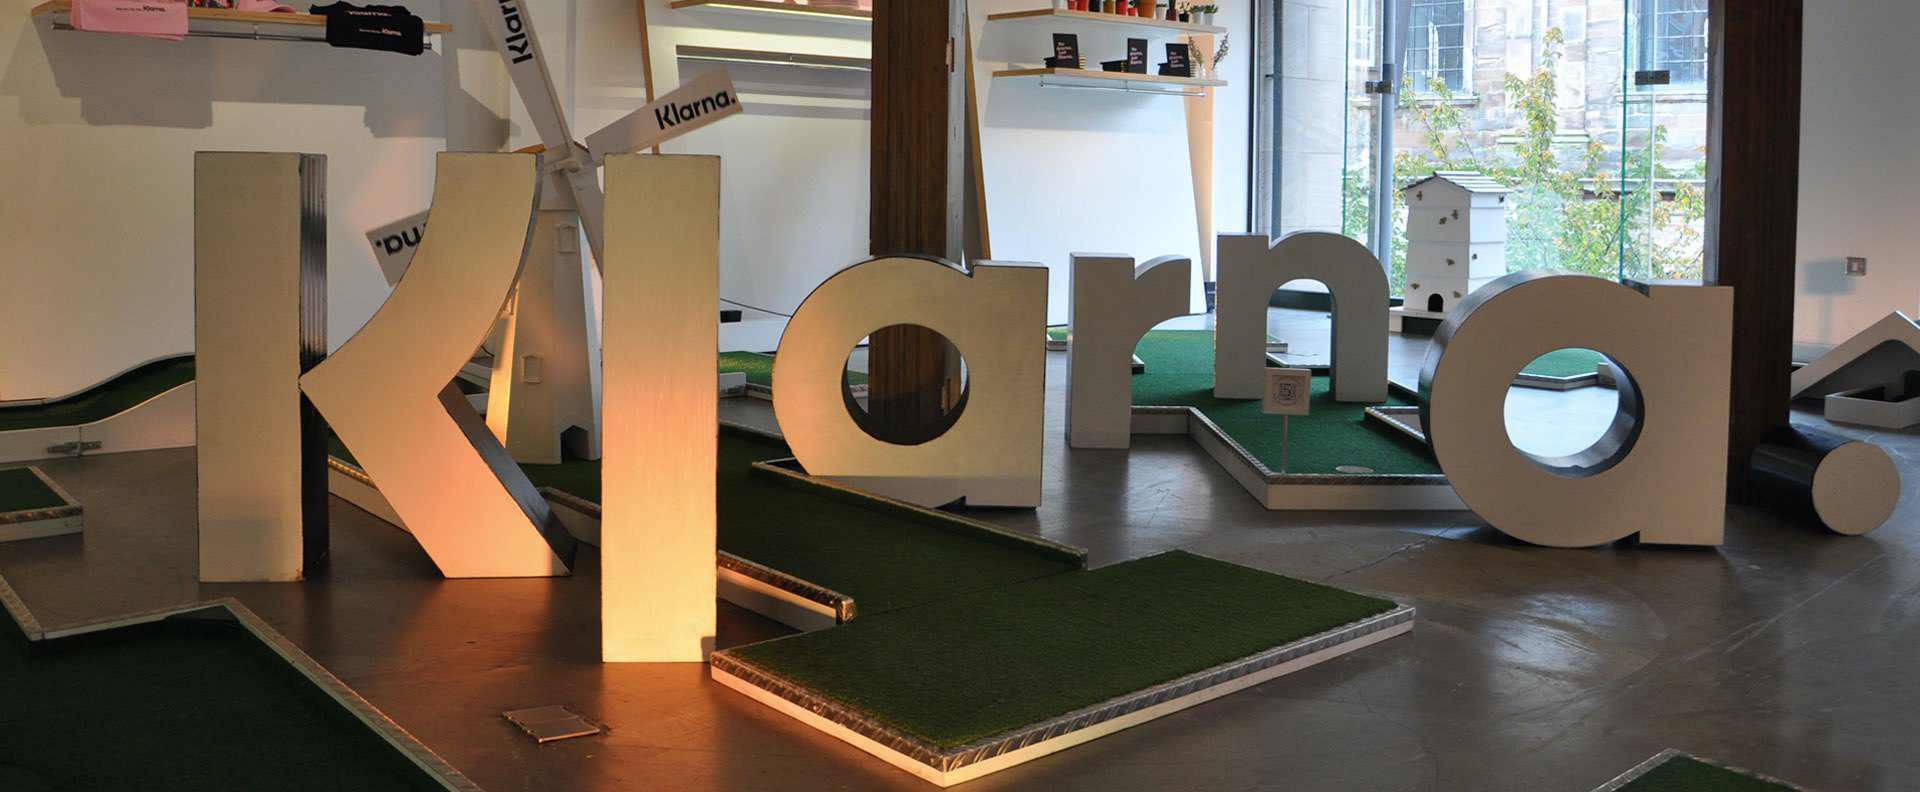 mobile crazy golf corporate events - Klarna